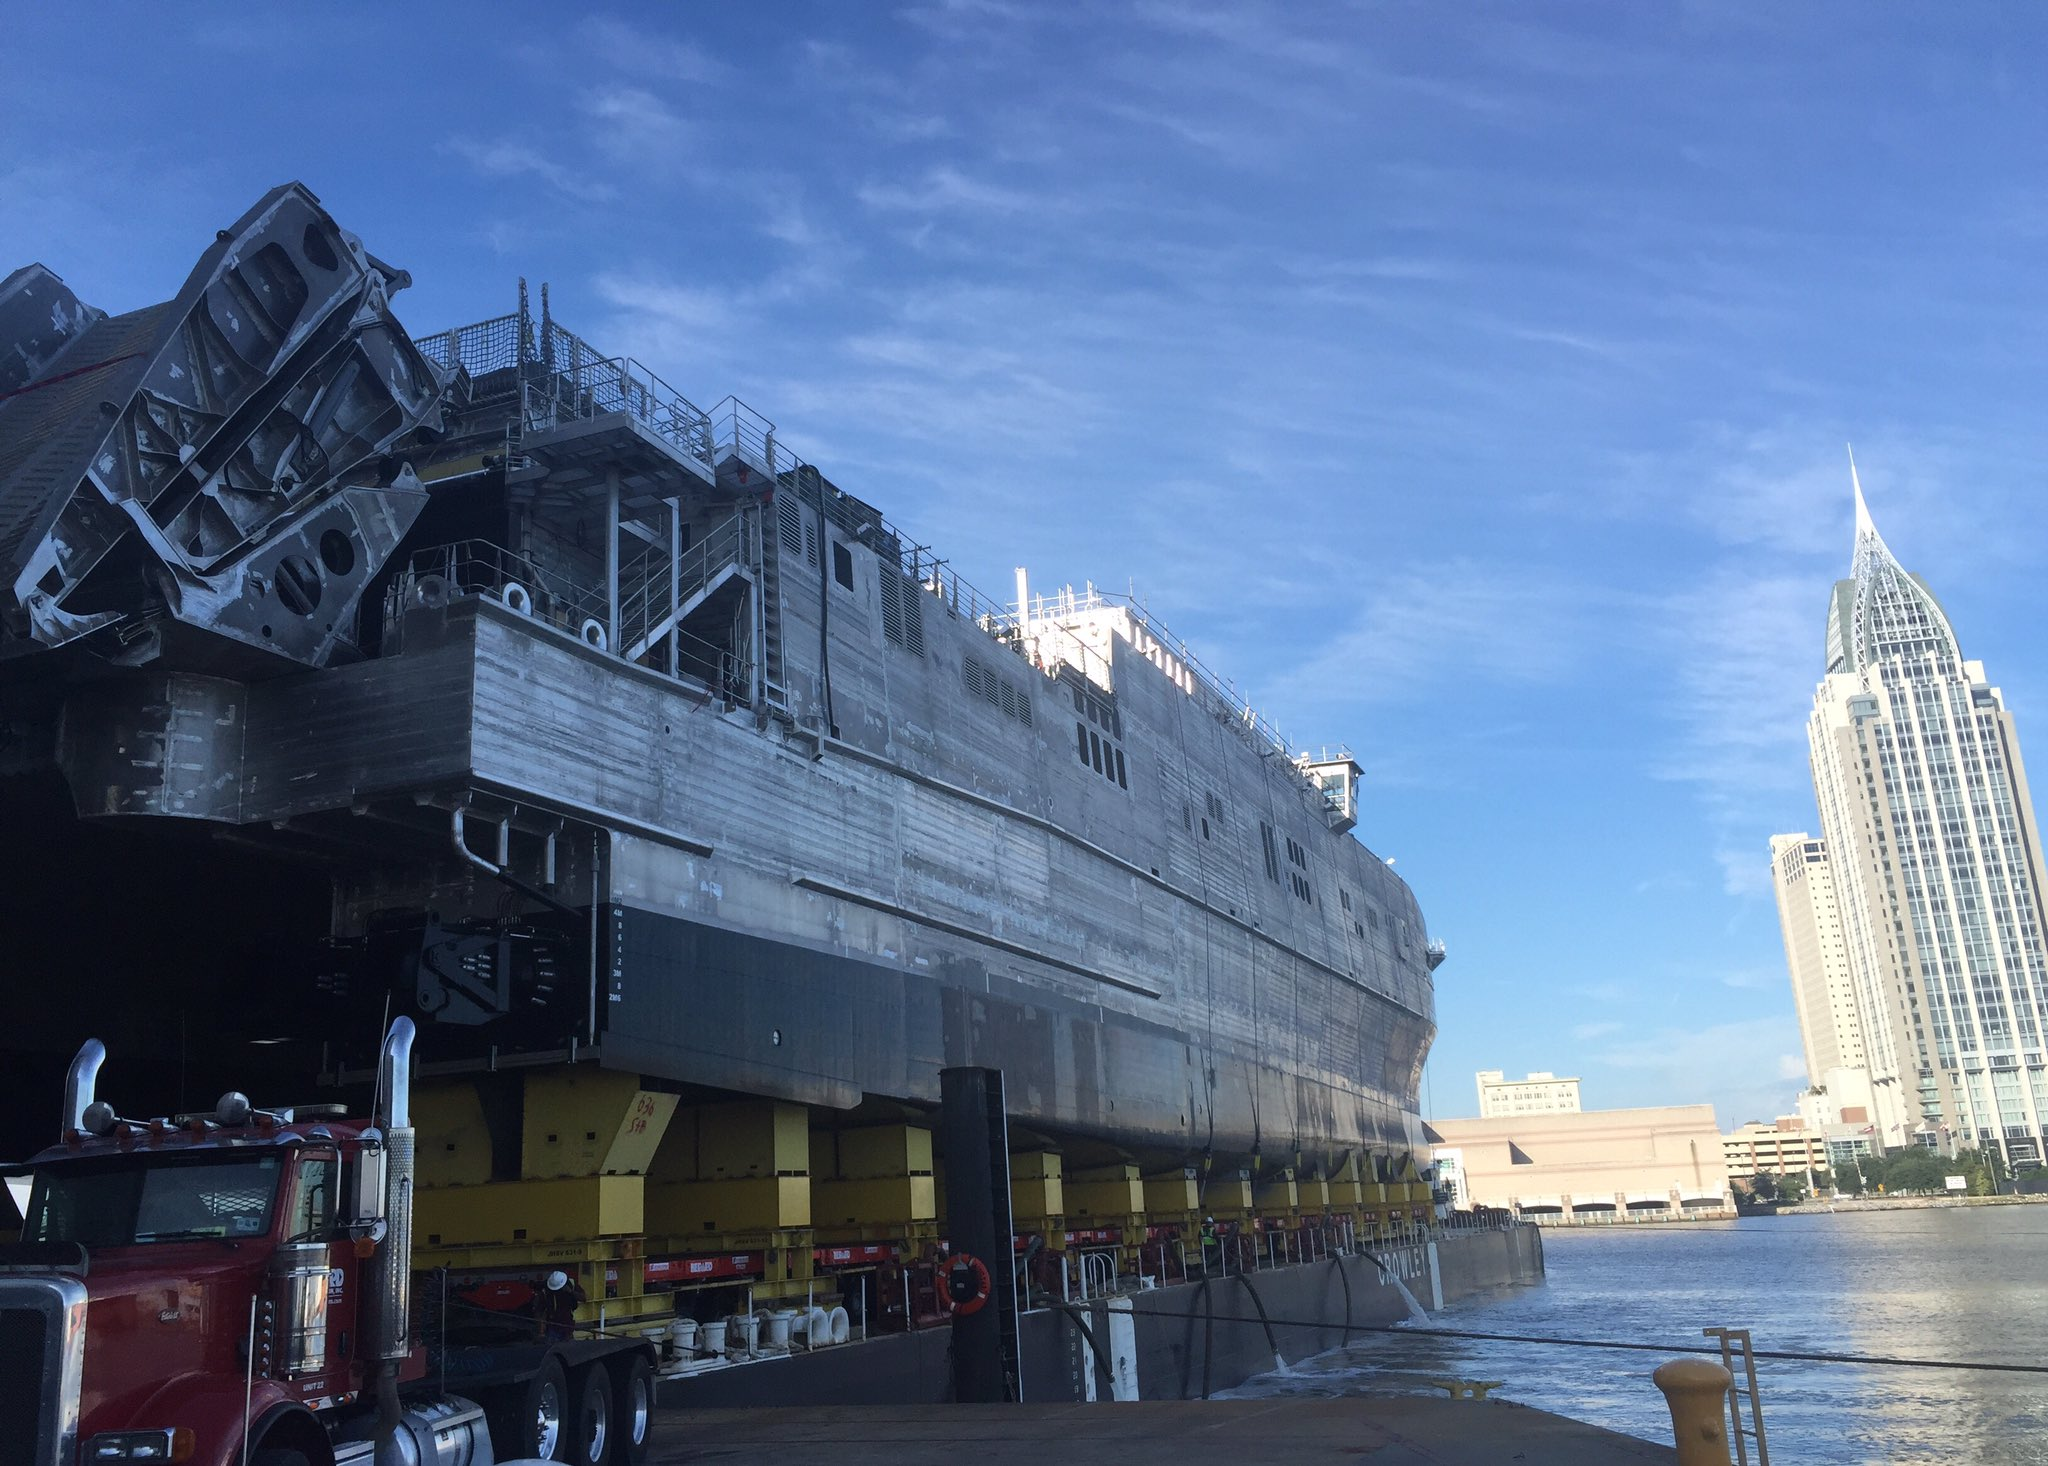 Austal Alabama shipyard to build 2 additional Navy transports   Made